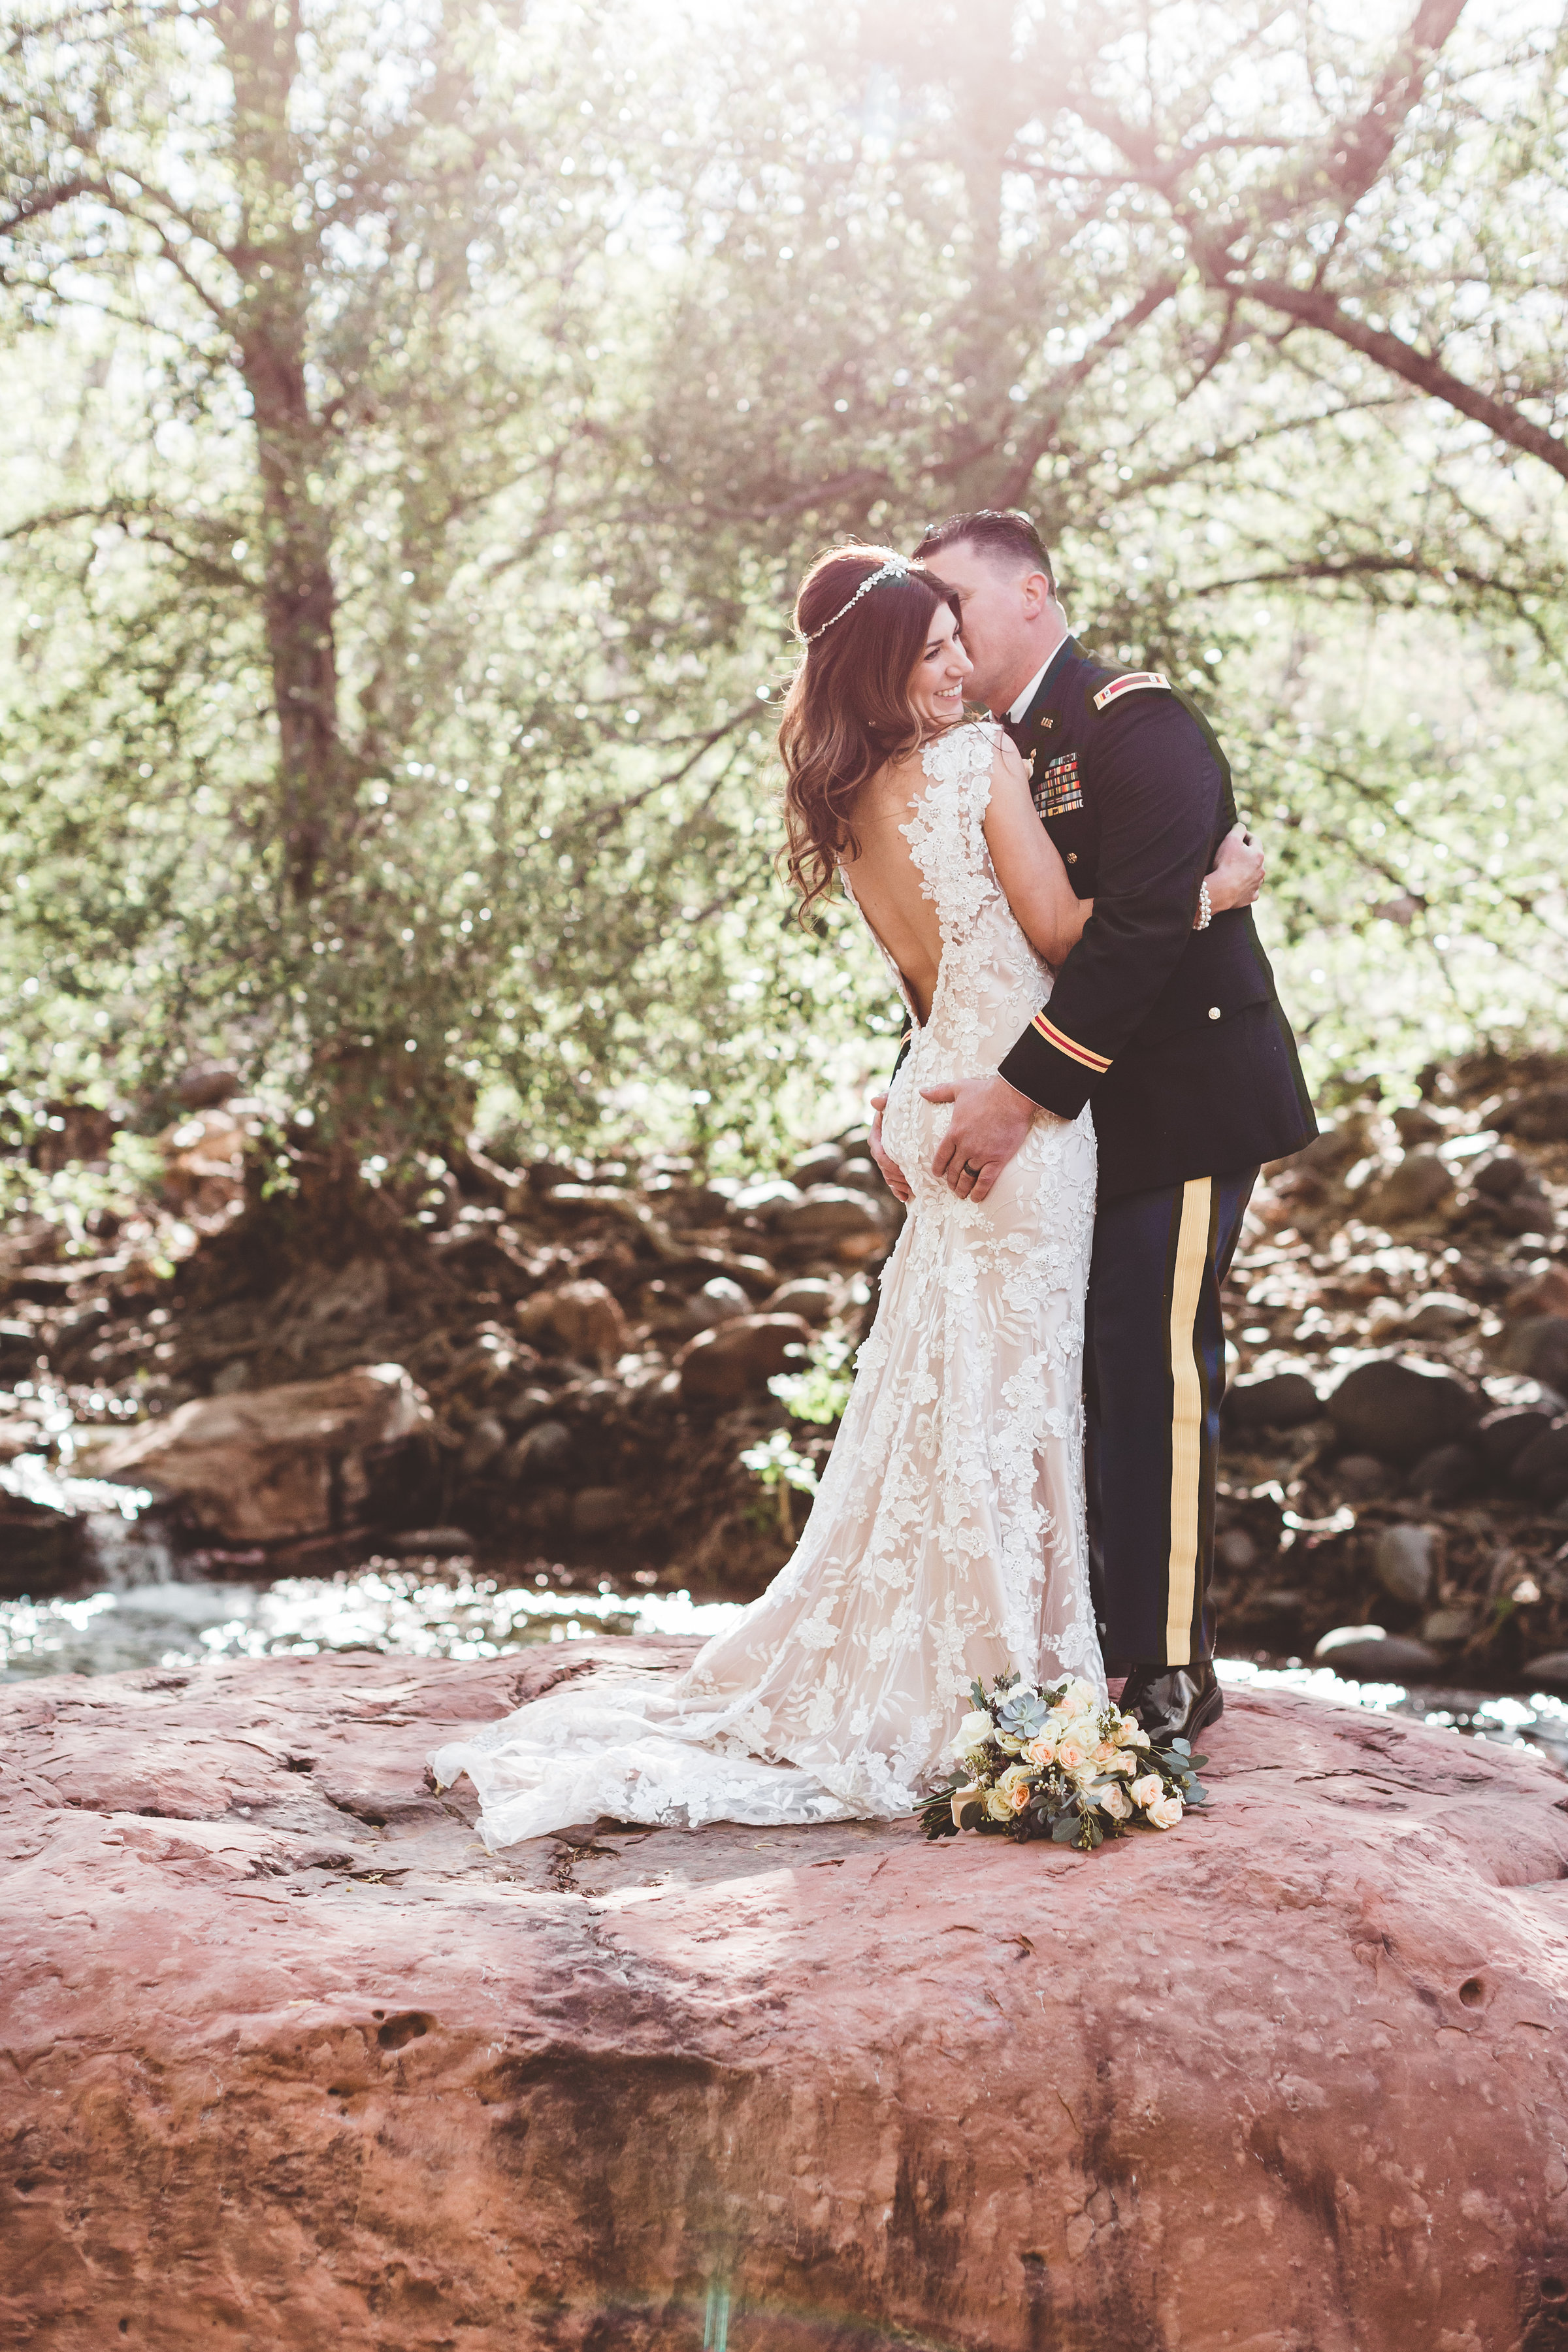 jenna-and-erics-romantic-sedona-wedding30.jpg